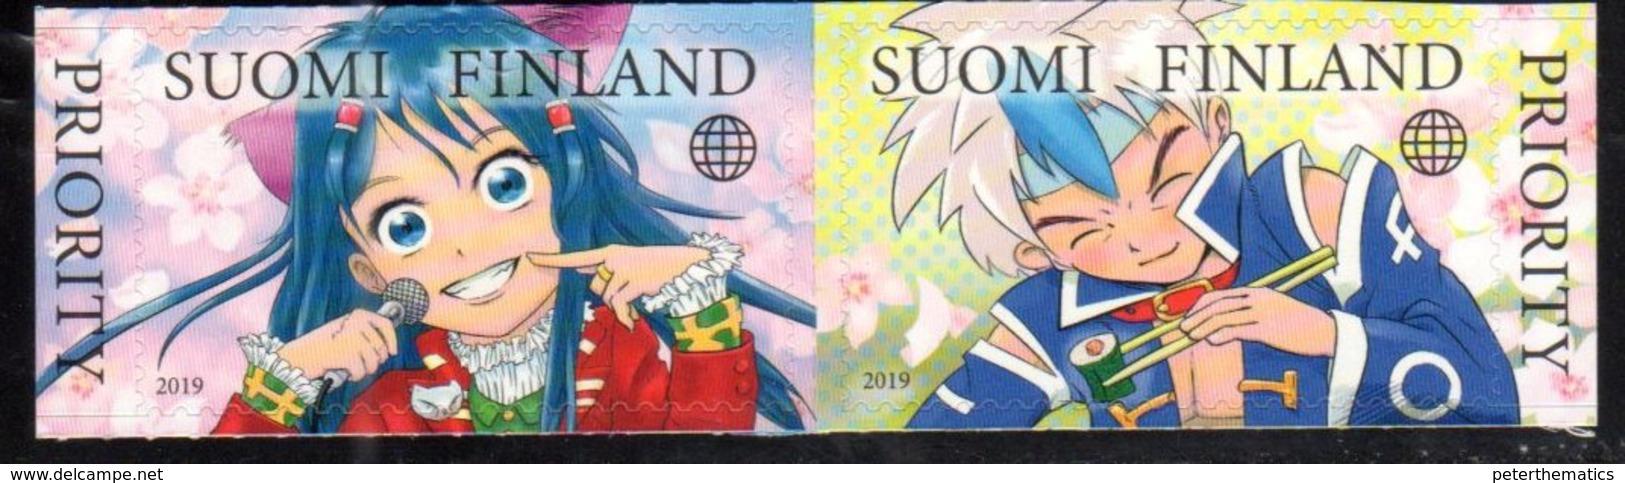 FINLAND, 2019, MNH, JAPANESE INFLUENCES, CARTOONS, 2v - Enfance & Jeunesse